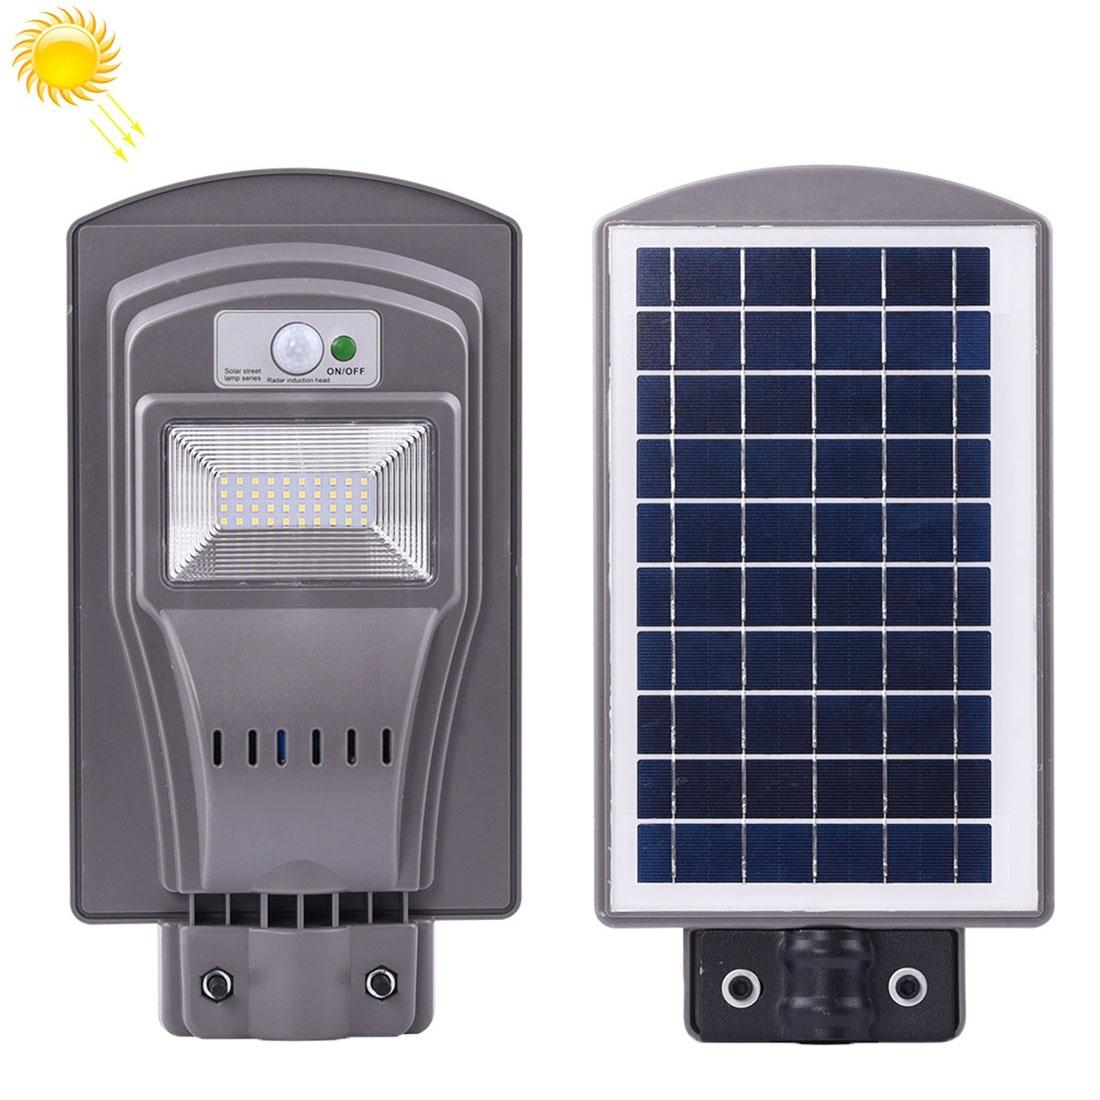 20W IP65 Waterproof Radar Sensor + Light Control Solar Power Street Light, 40 LEDs Energy Saving Outdoor Lamp with 6V / 12W Solar Panel